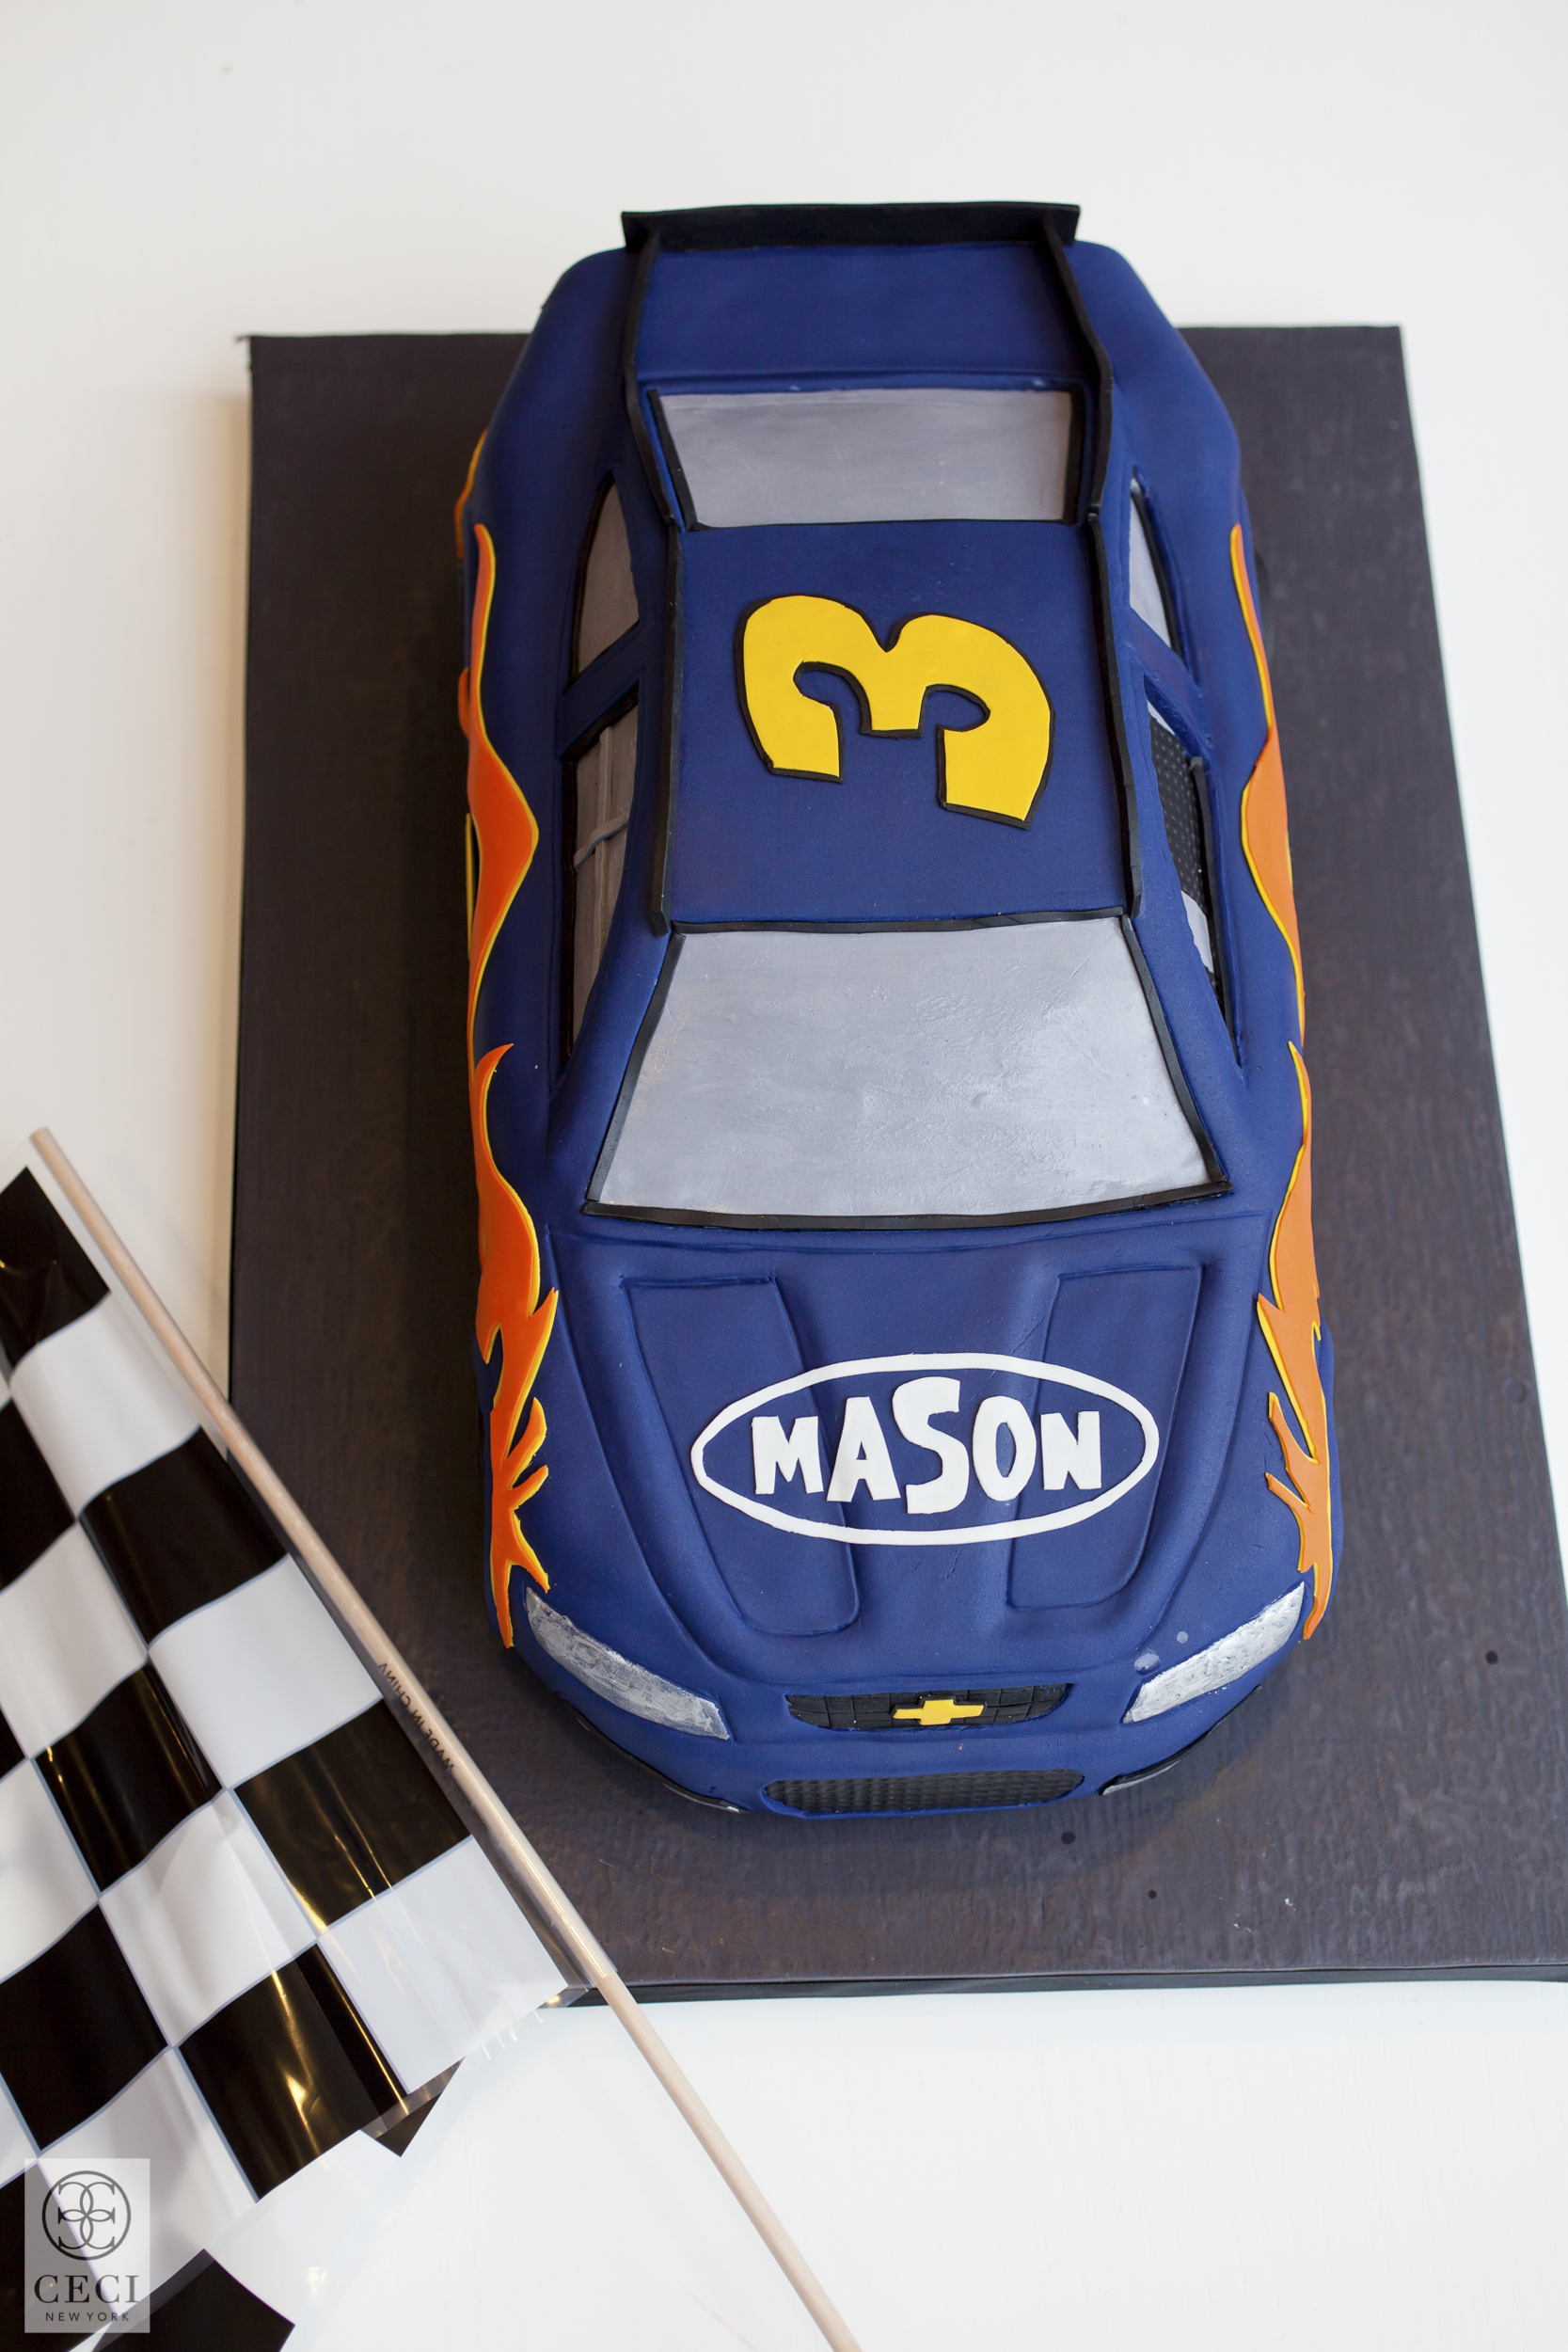 ceci_new_york_mason_ceci_johnson_race_car_birthday_party-4.jpg